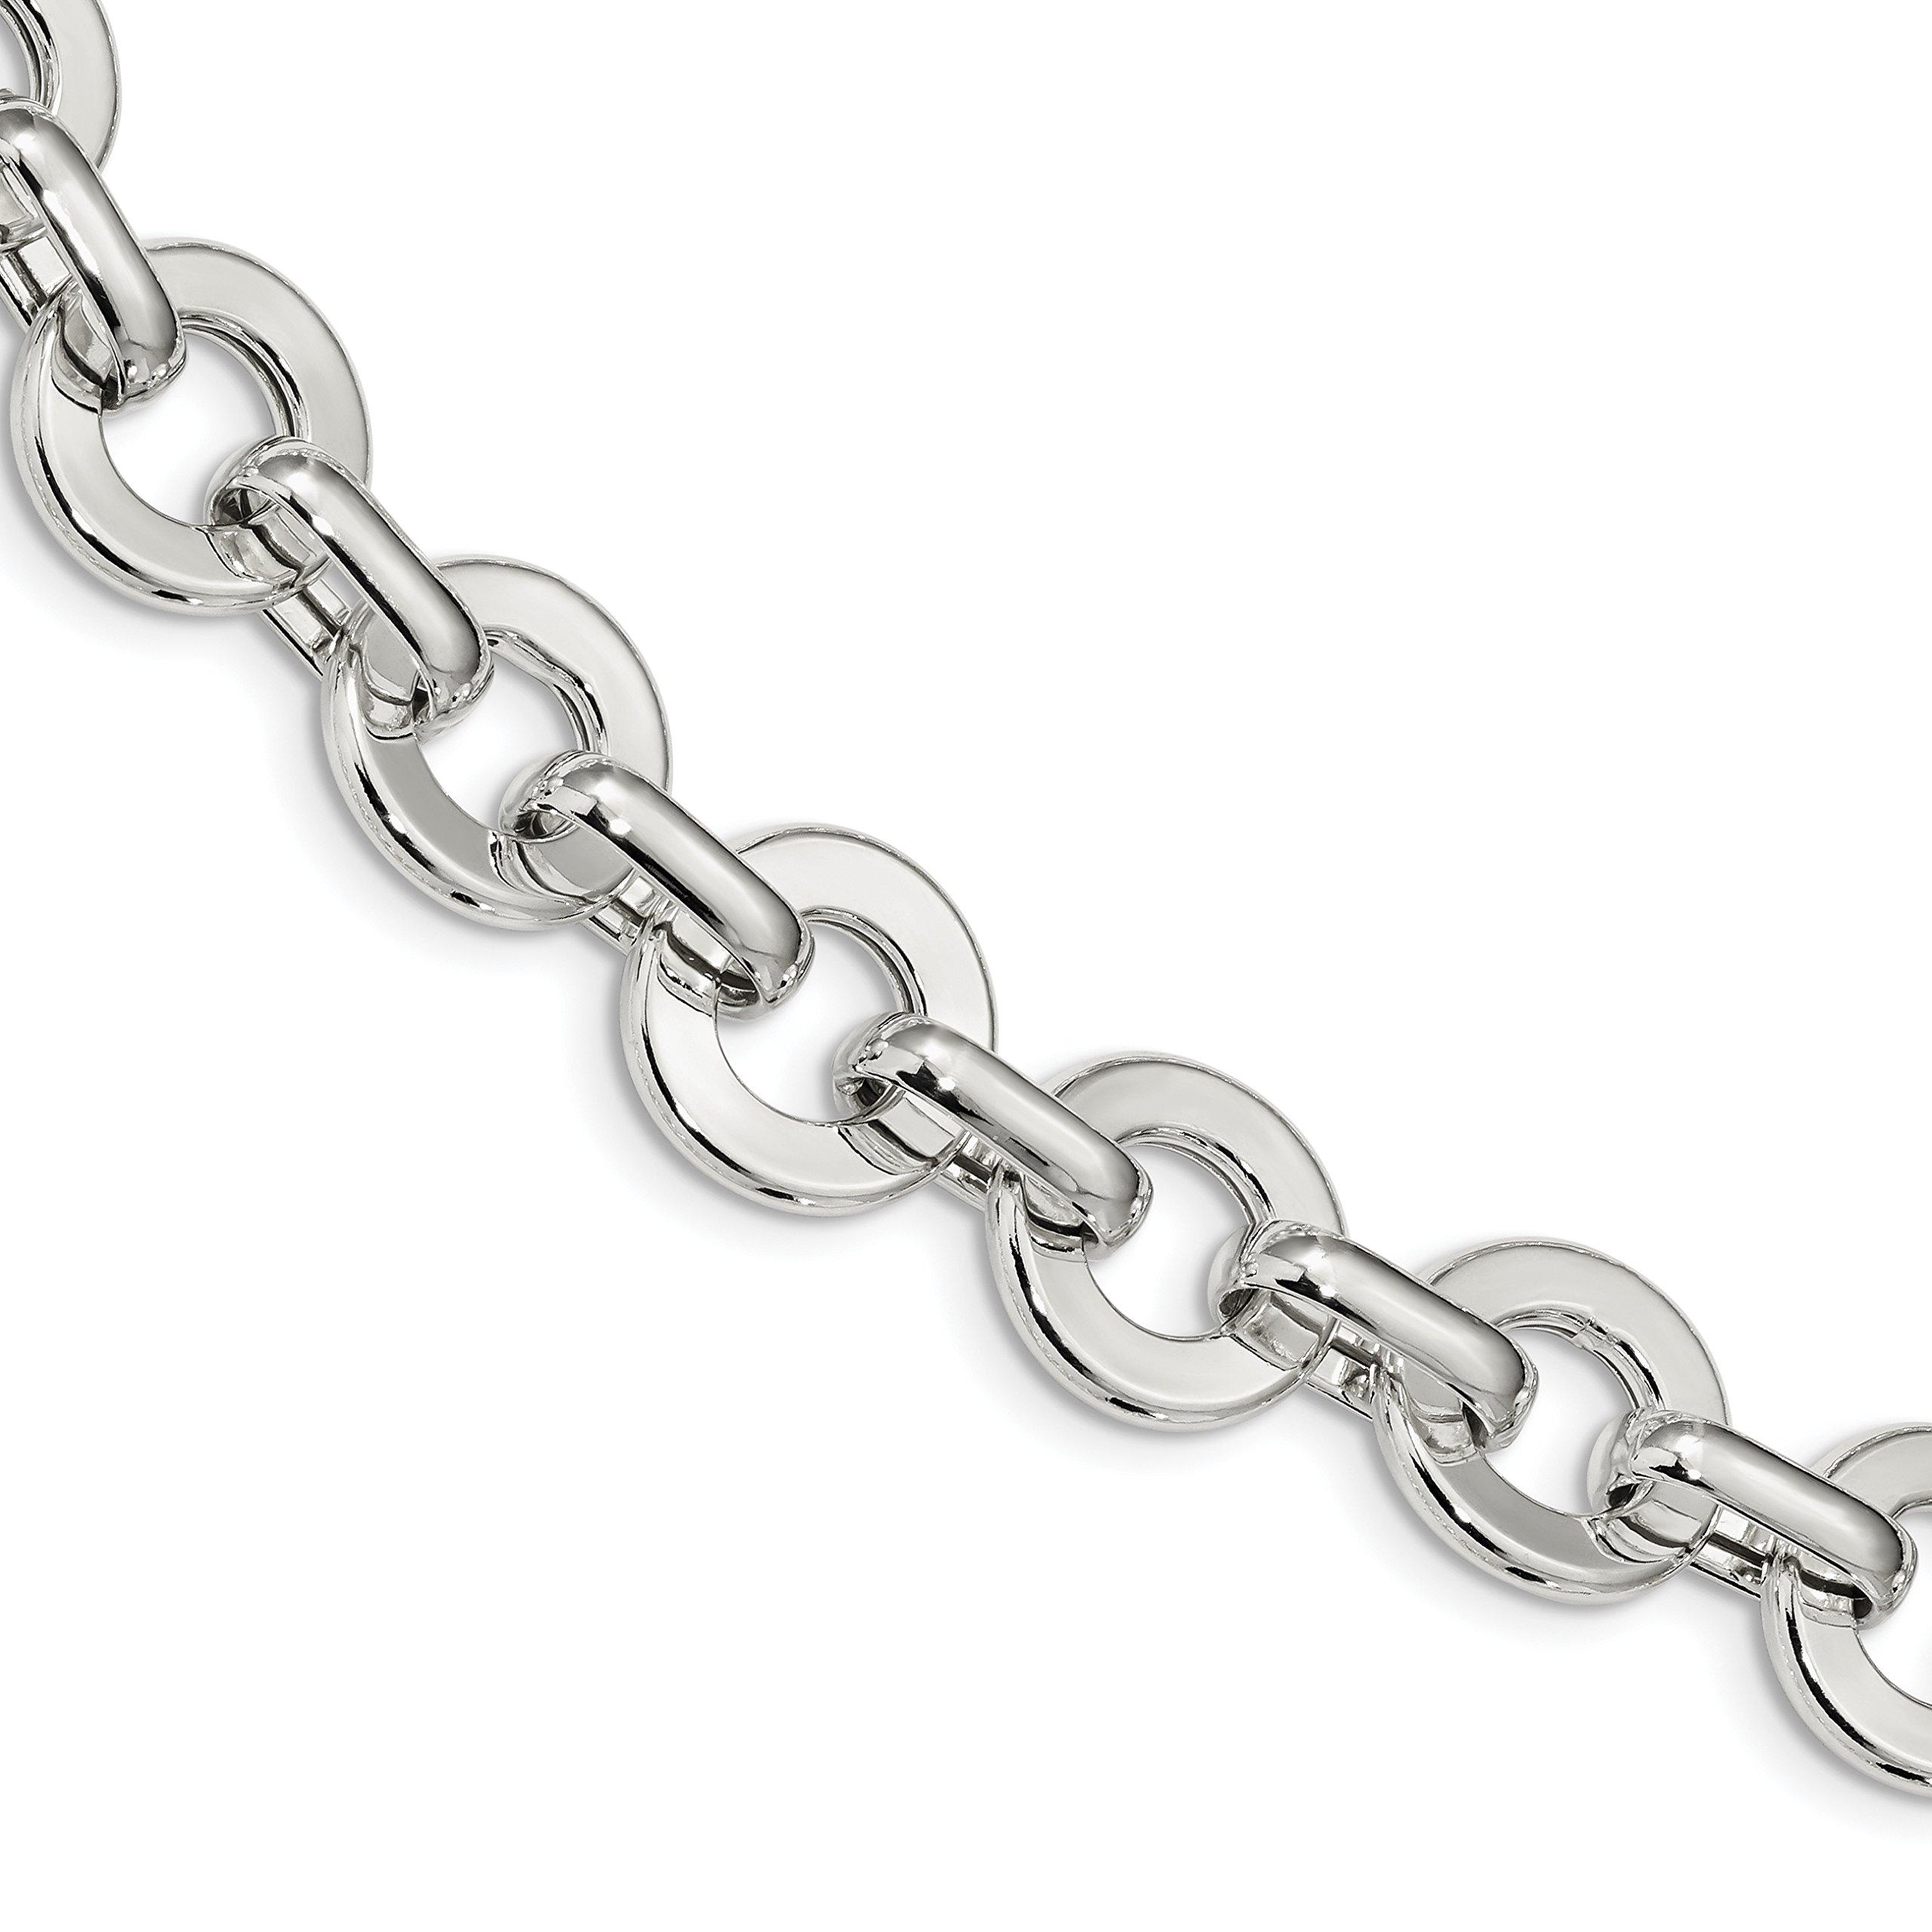 ICE CARATS 925 Sterling Silver Circle Link 7.5 Inch Bracelet Fancy Fine Jewelry Gift Set For Women Heart